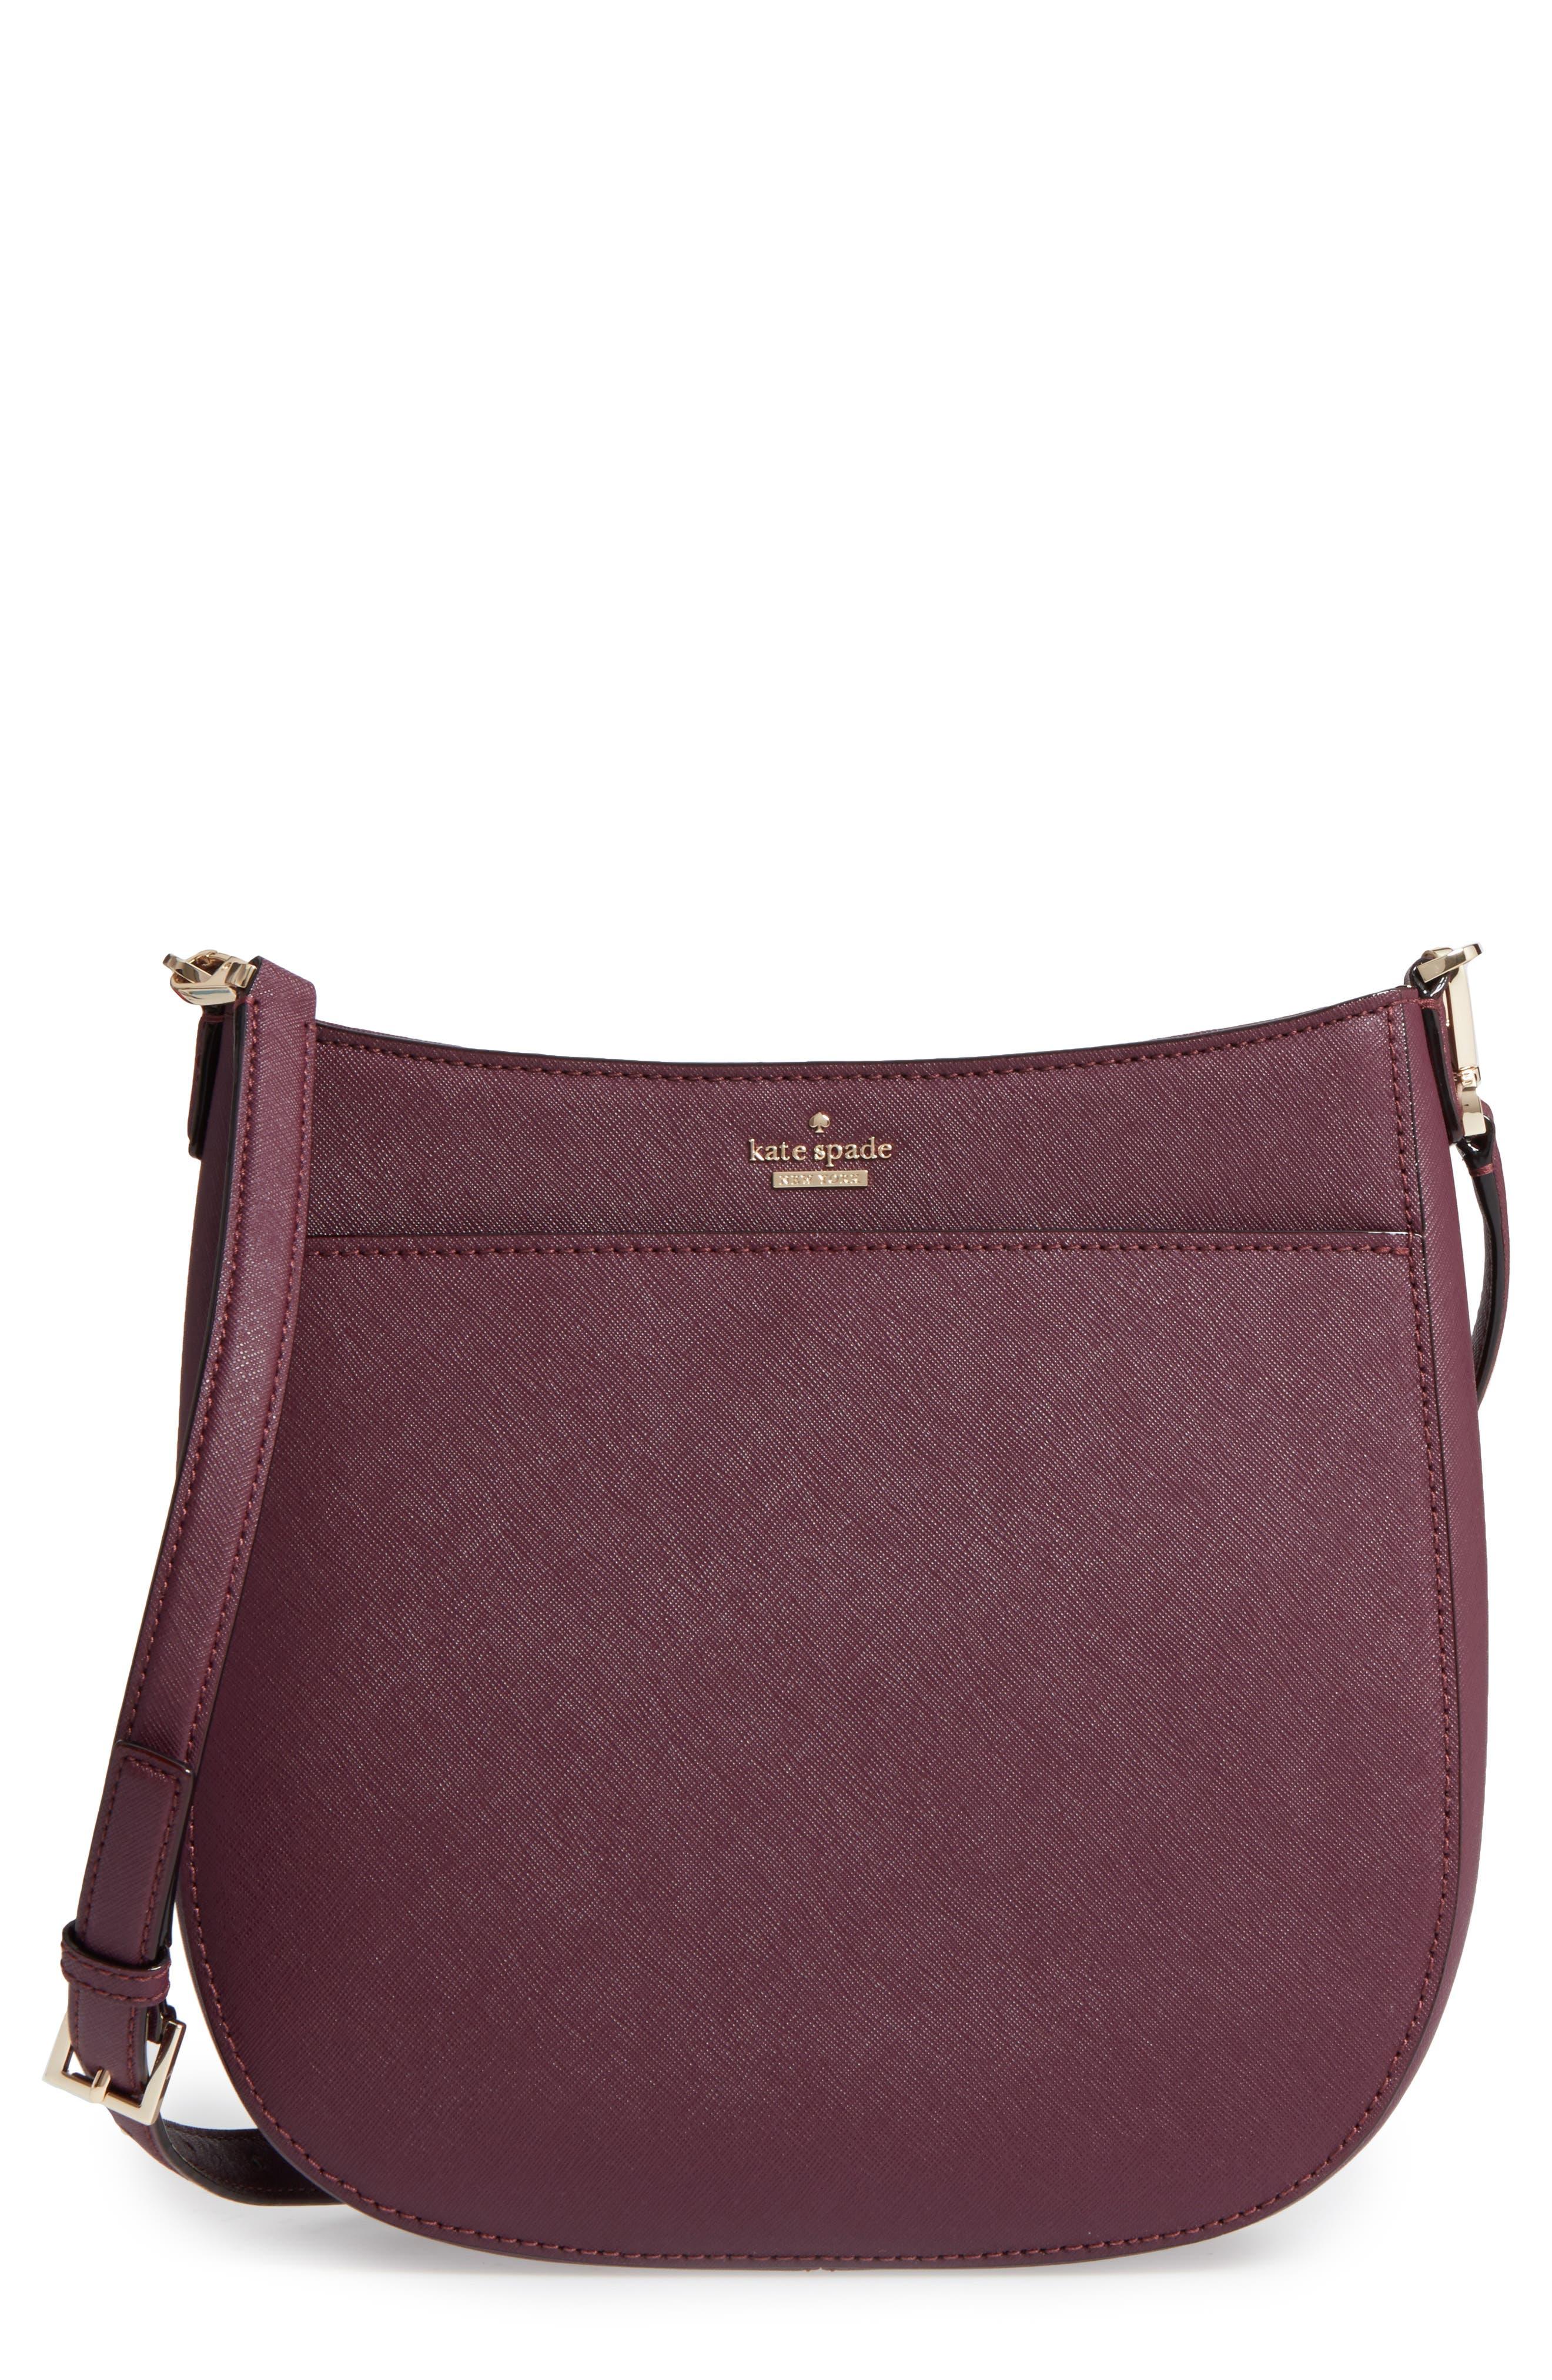 cameron street - robin leather crossbody bag,                             Main thumbnail 1, color,                             Deep Plum